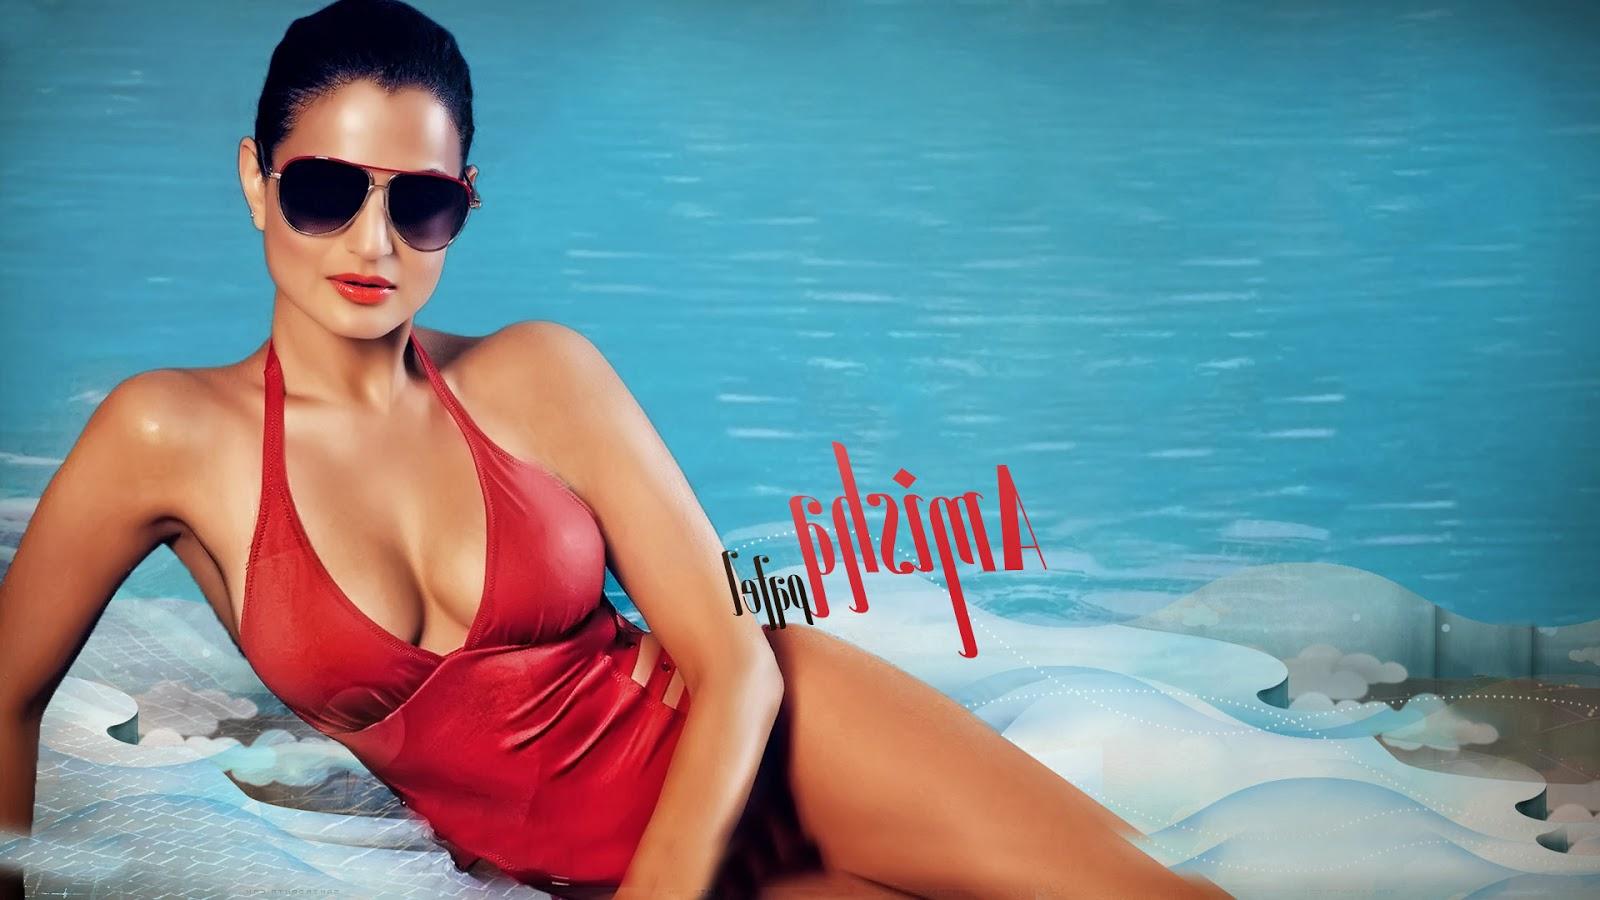 Hot Infotainment Pictures Amisha Patel Red Bikini Hot Photos-7015